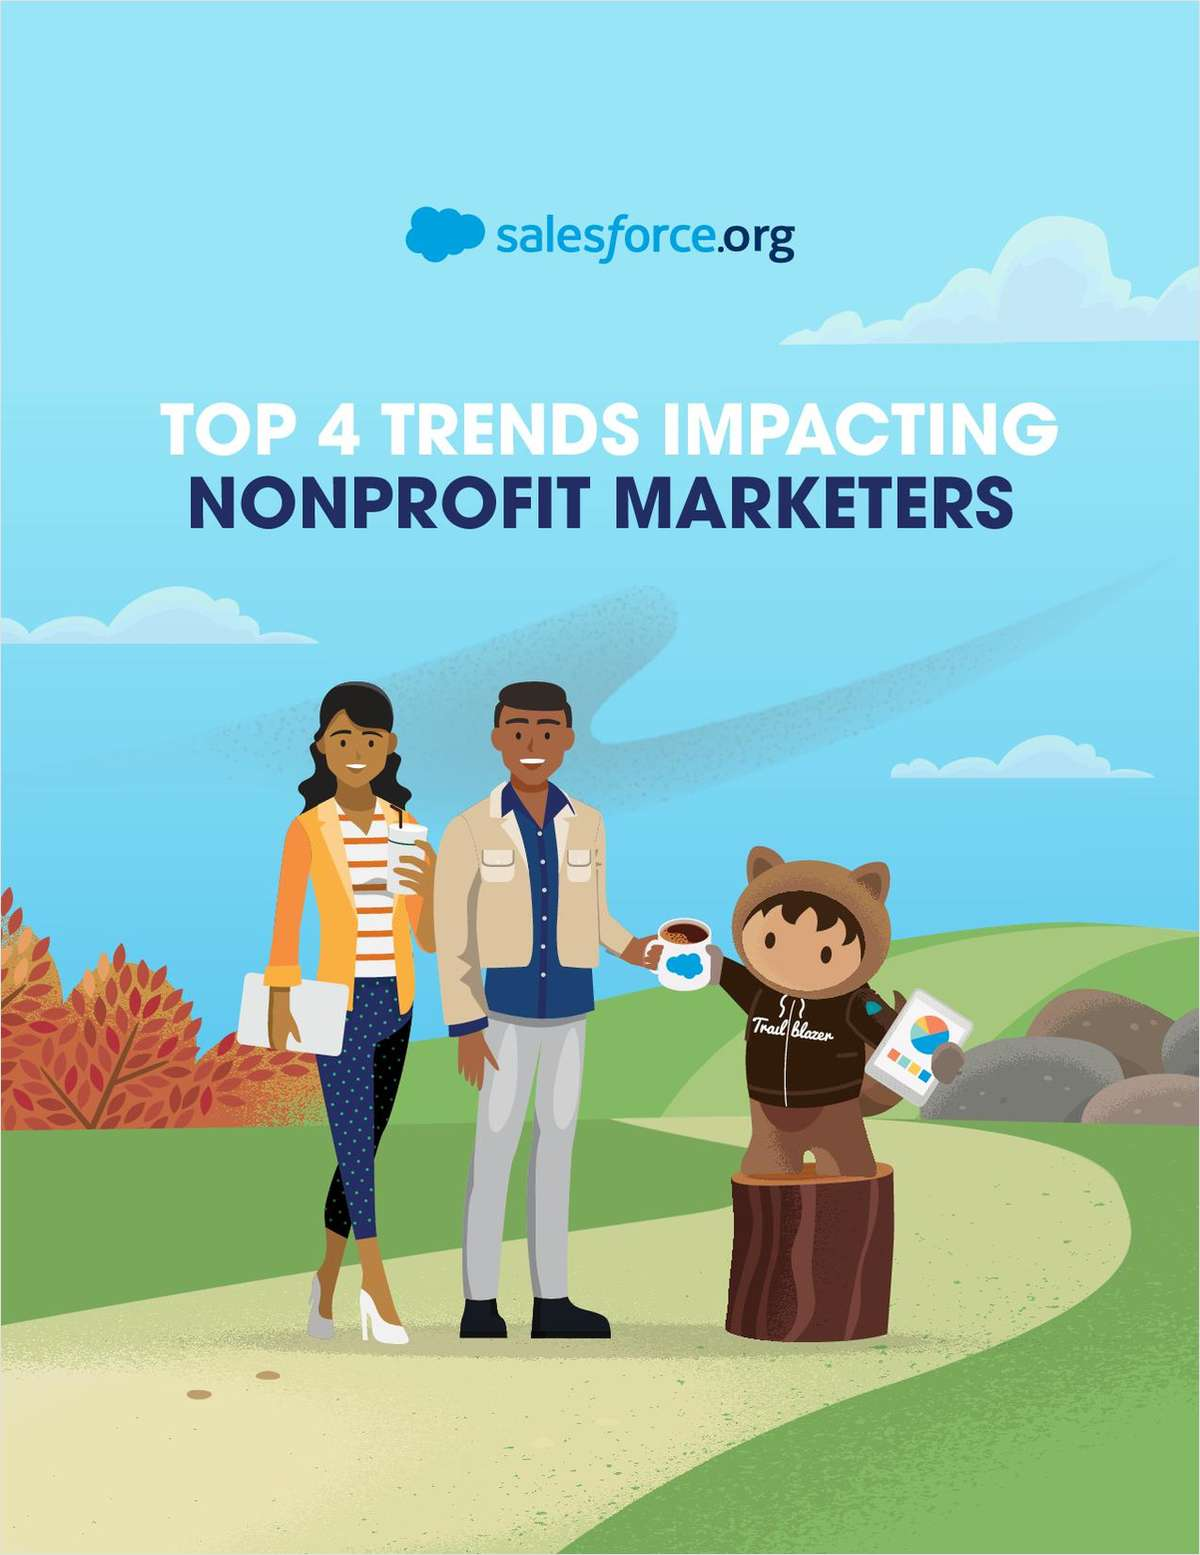 Top 4 Trends Impacting Nonprofit Marketers